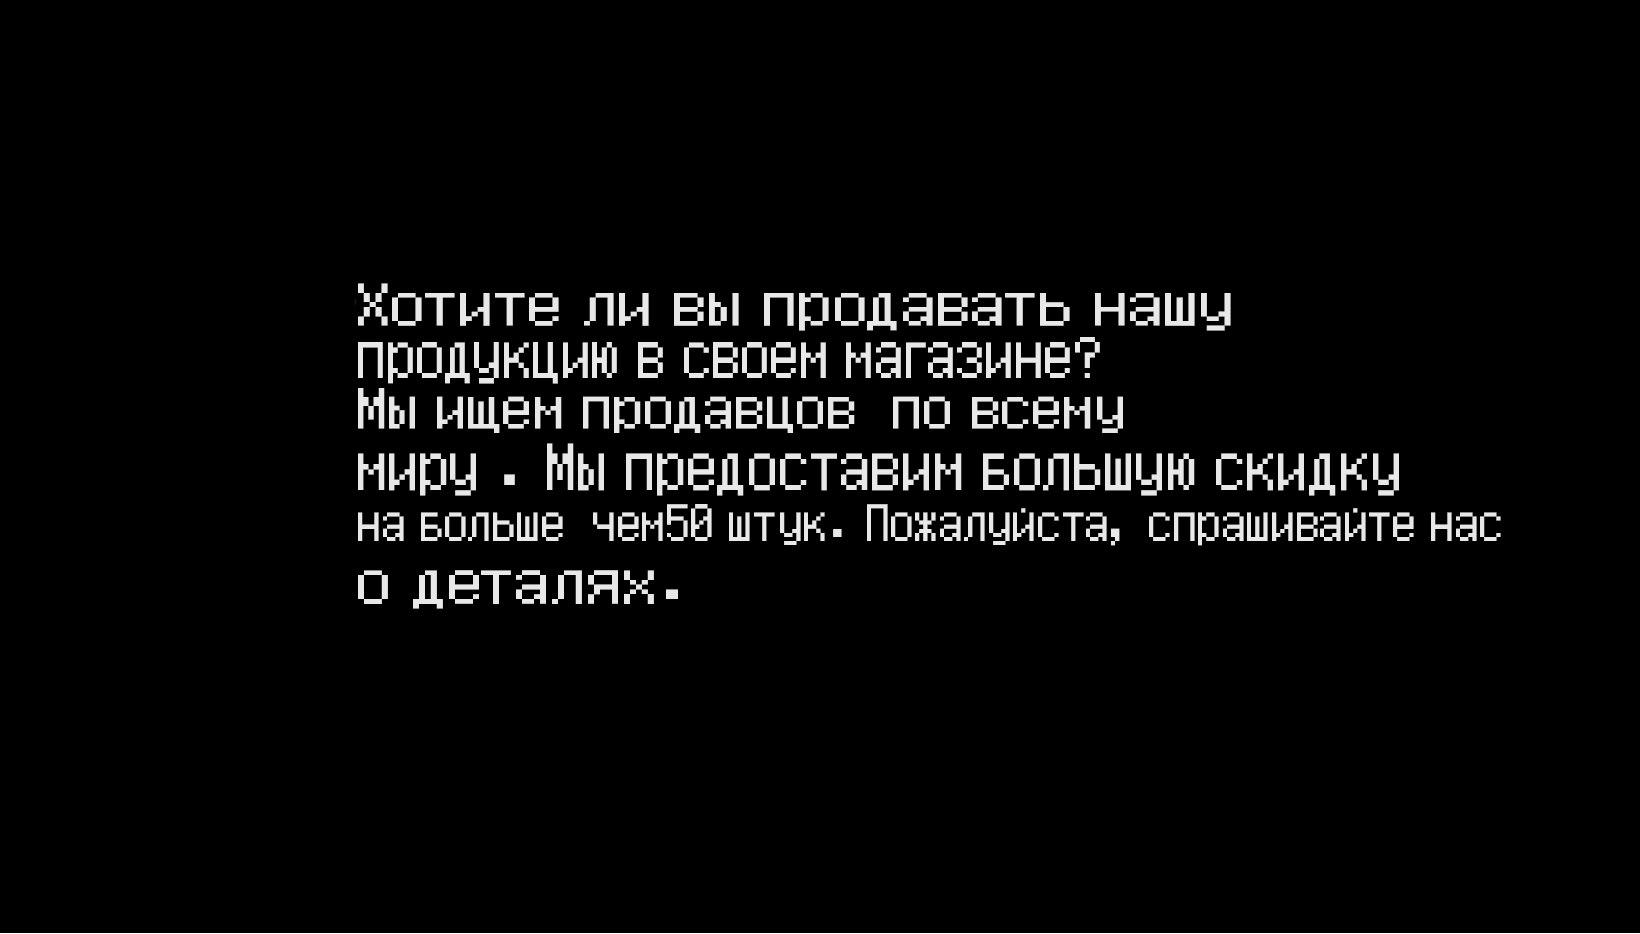 https://pp.userapi.com/c840134/v840134464/2679e/jEI5IyqZJgM.jpg